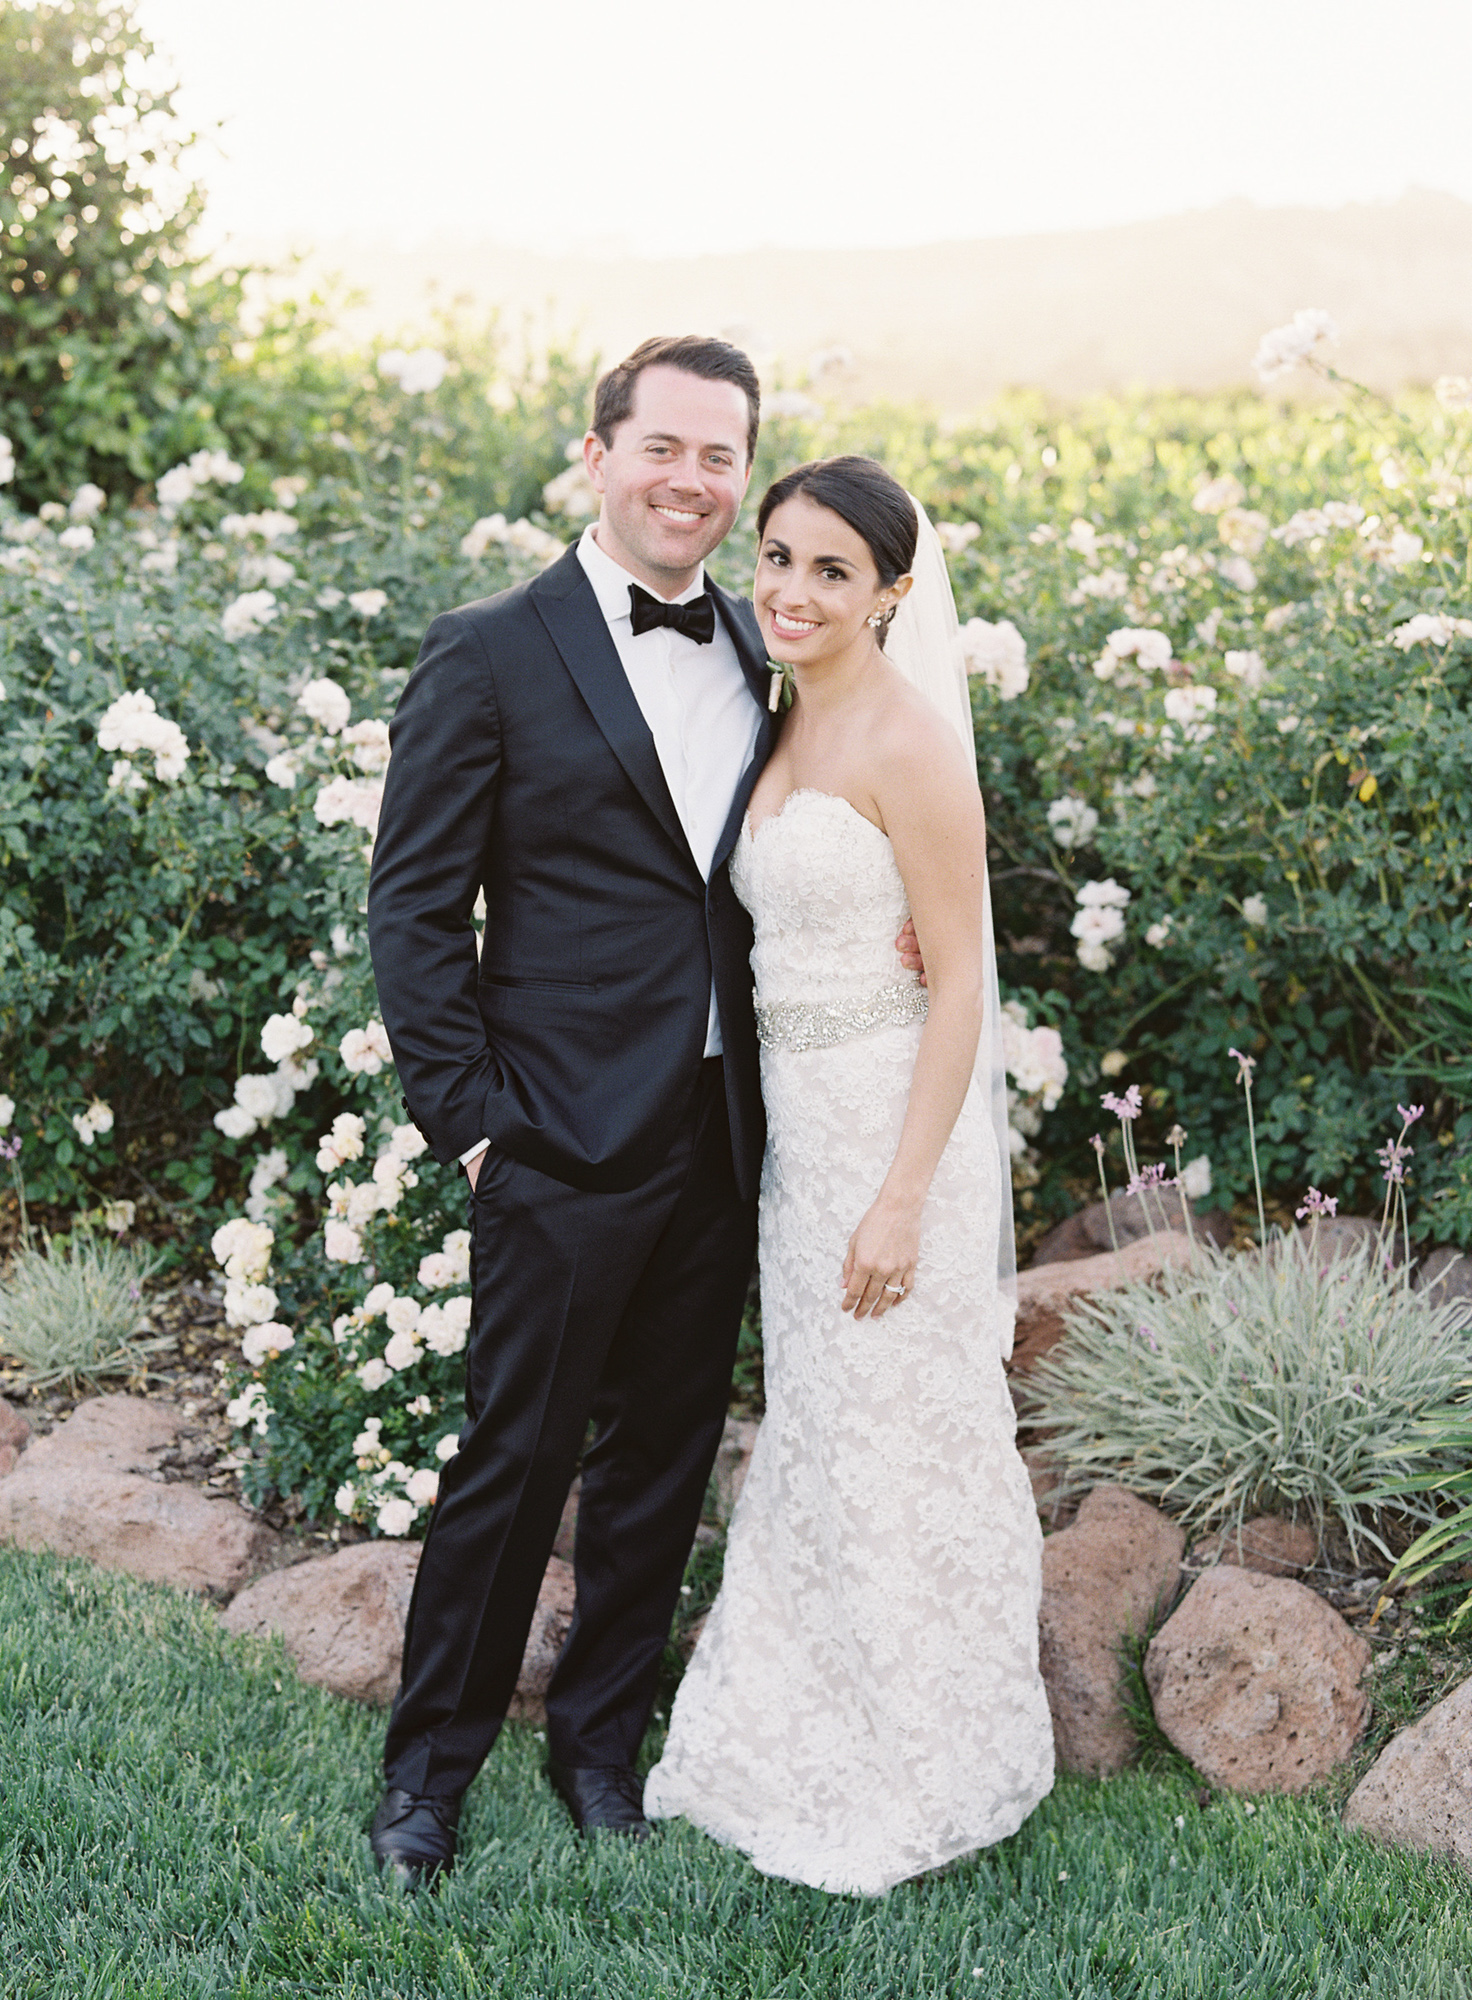 Gerry-Ranch-Wedding-Photography-Kristina-Adams-25.jpg